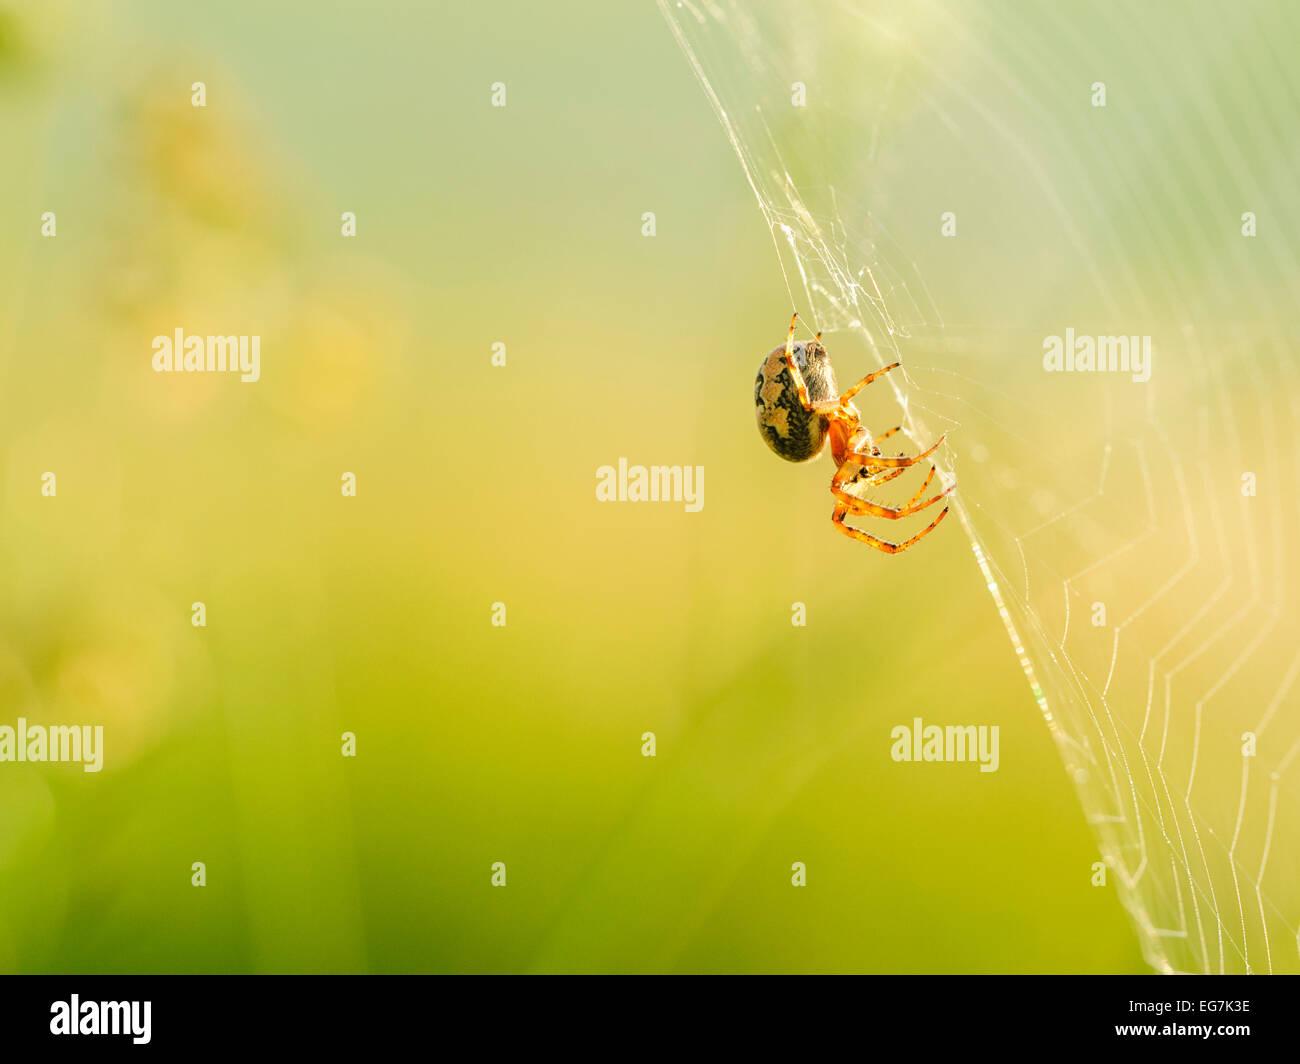 Cross spider (Araneus diadematus) closeup on web with a light blurred green yellow background. Stock Photo